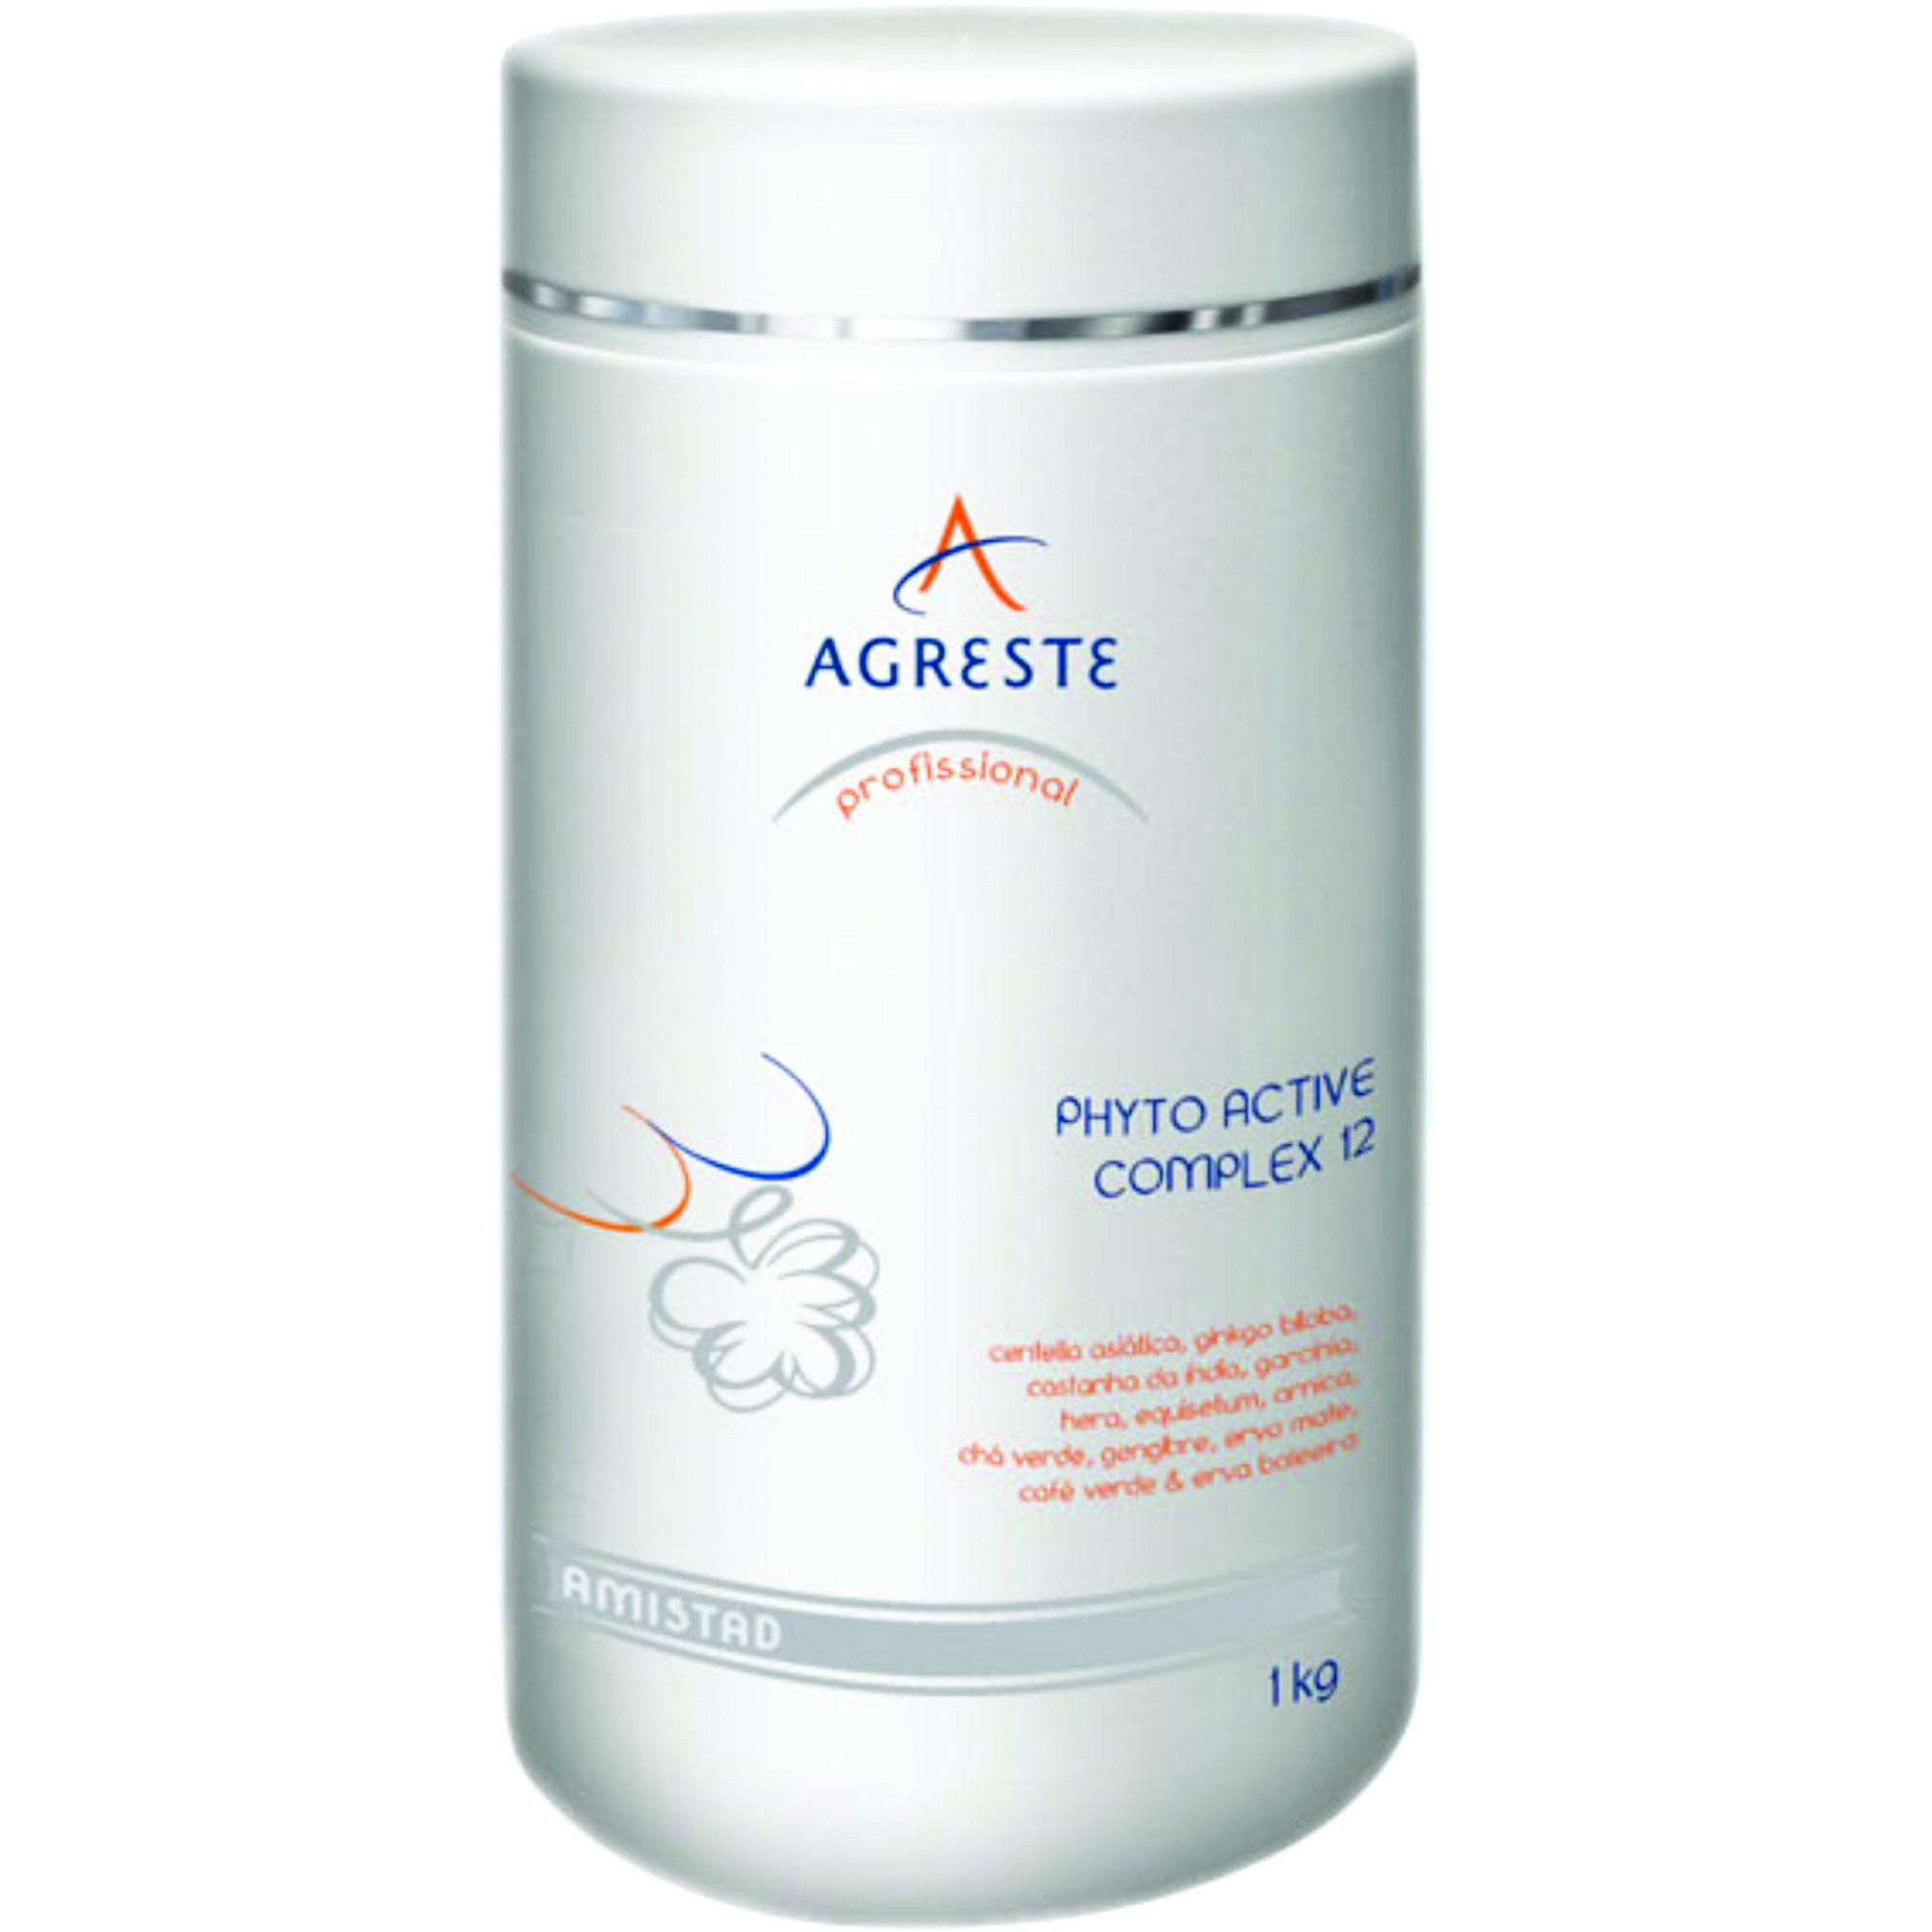 Phyto Active Complex 12 Ativos AMISTAD - 1 kg  - Agreste Brasil - Cosmética Profissional